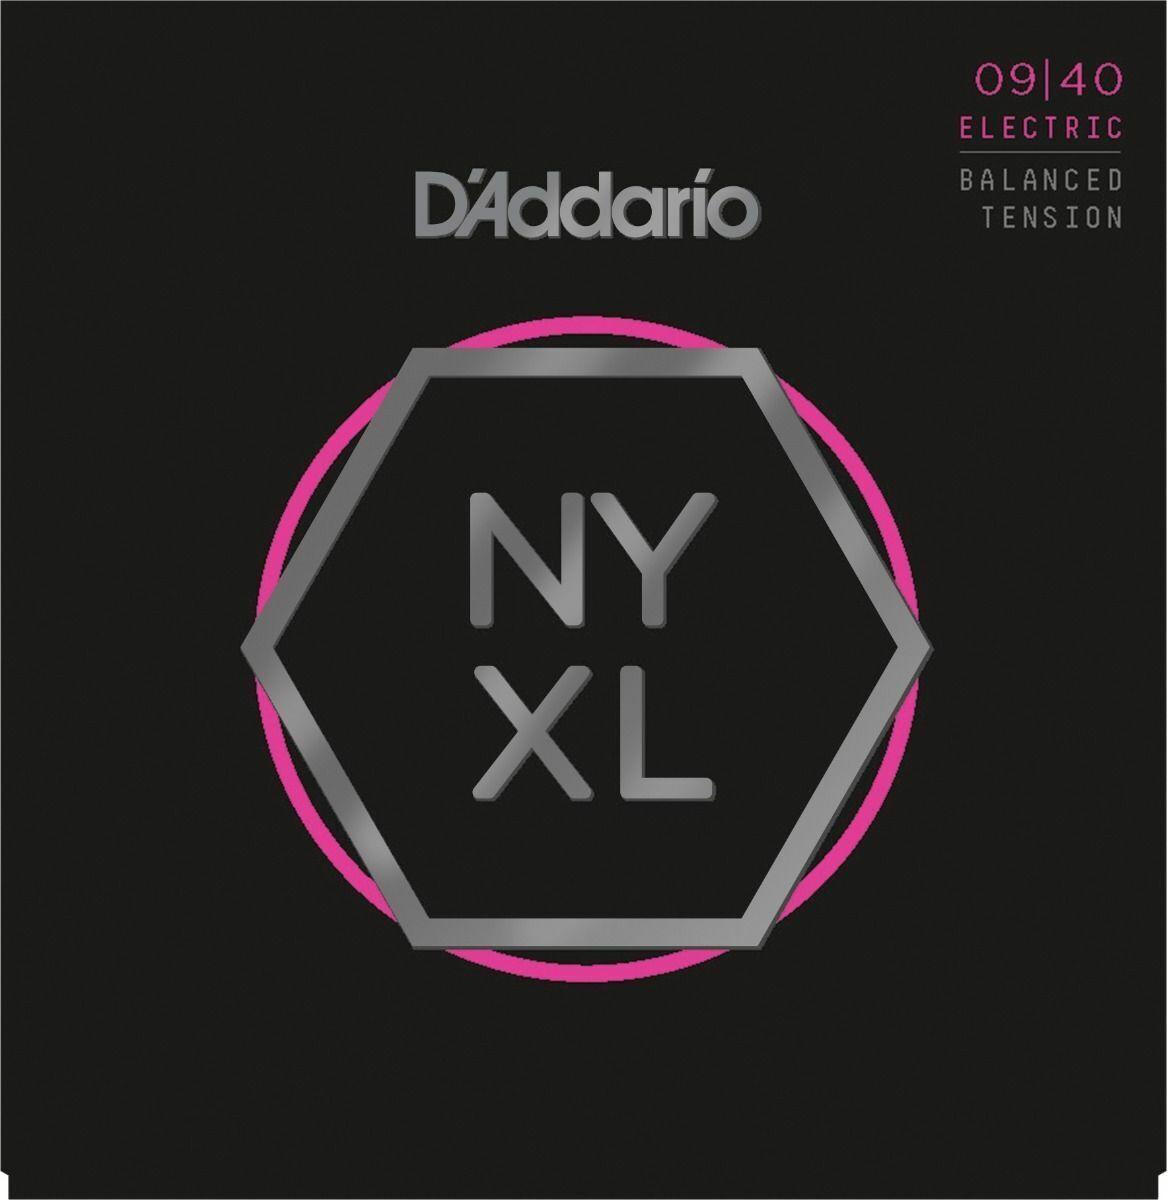 10 Sets D'Addario Nyxl 0940BT Super Light Auslaancient Spanning NYXL0940BT 9-40